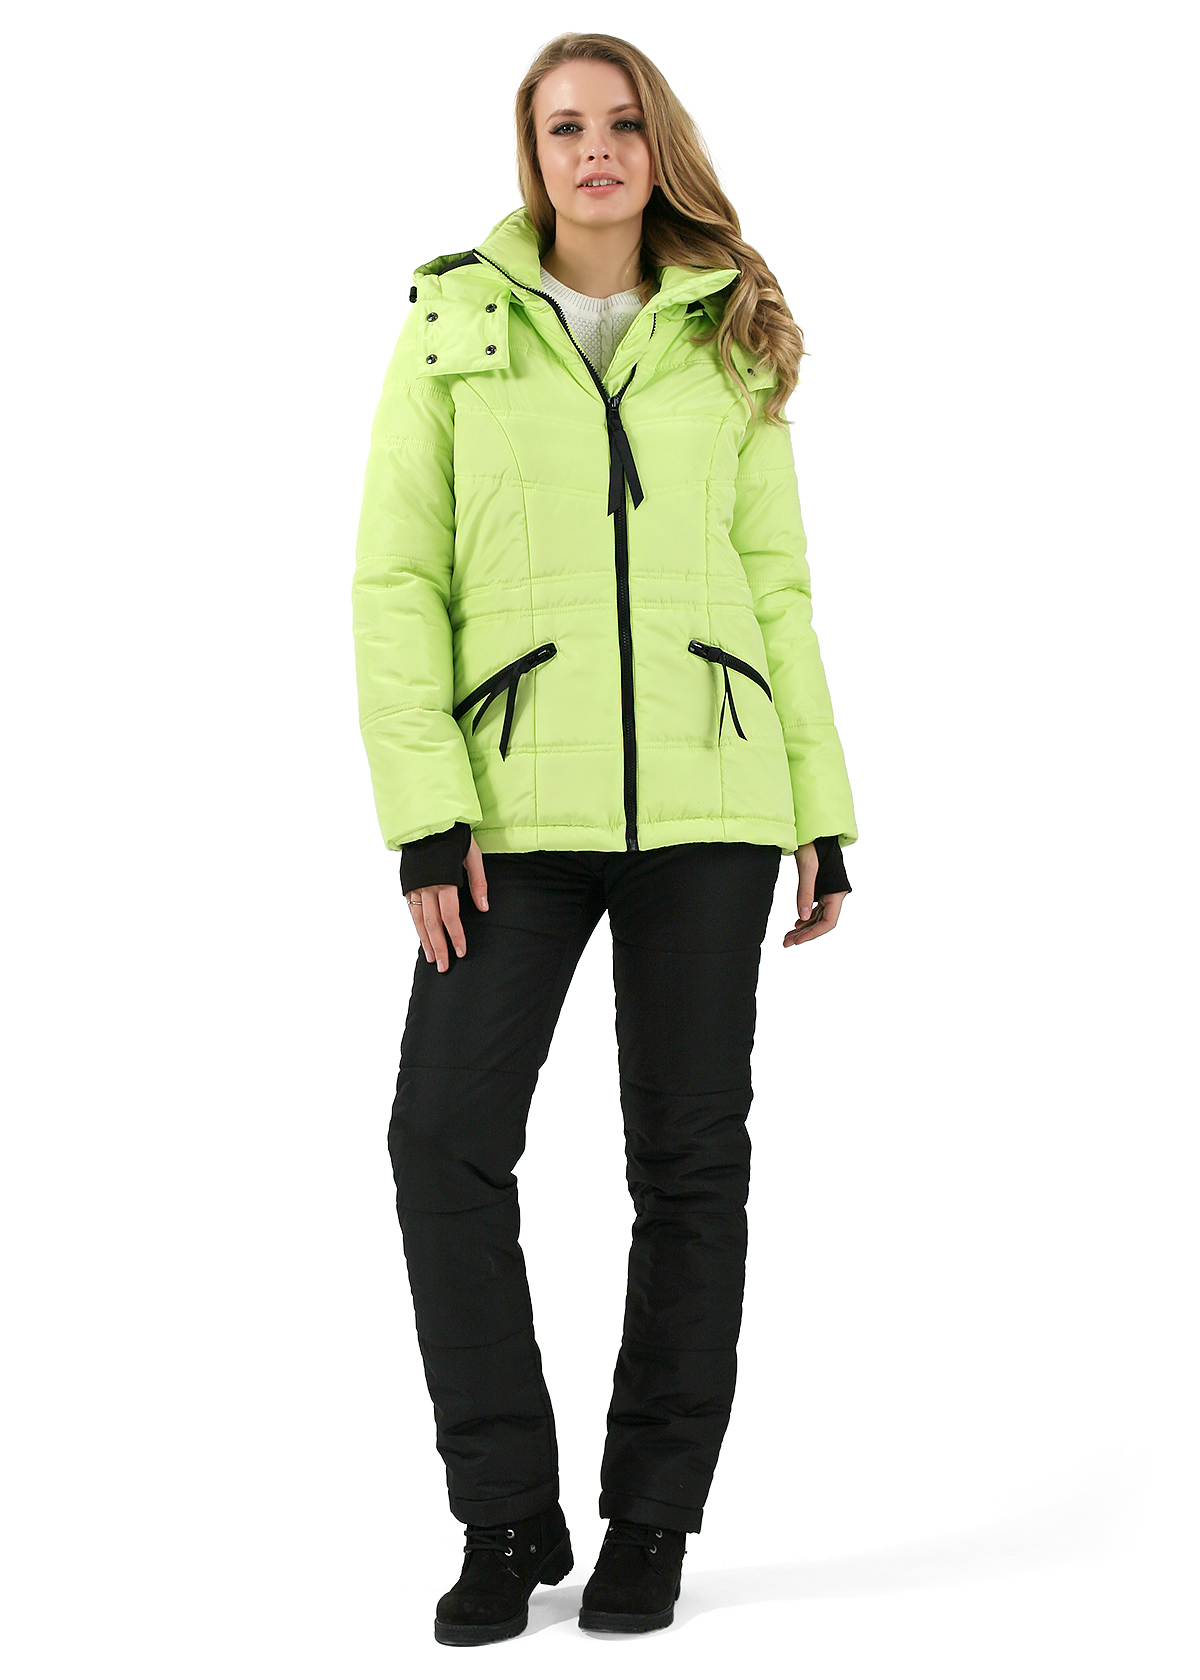 0e345ba39f6b ... Изображение Зимний комплект  куртка и брюки 2 в 1